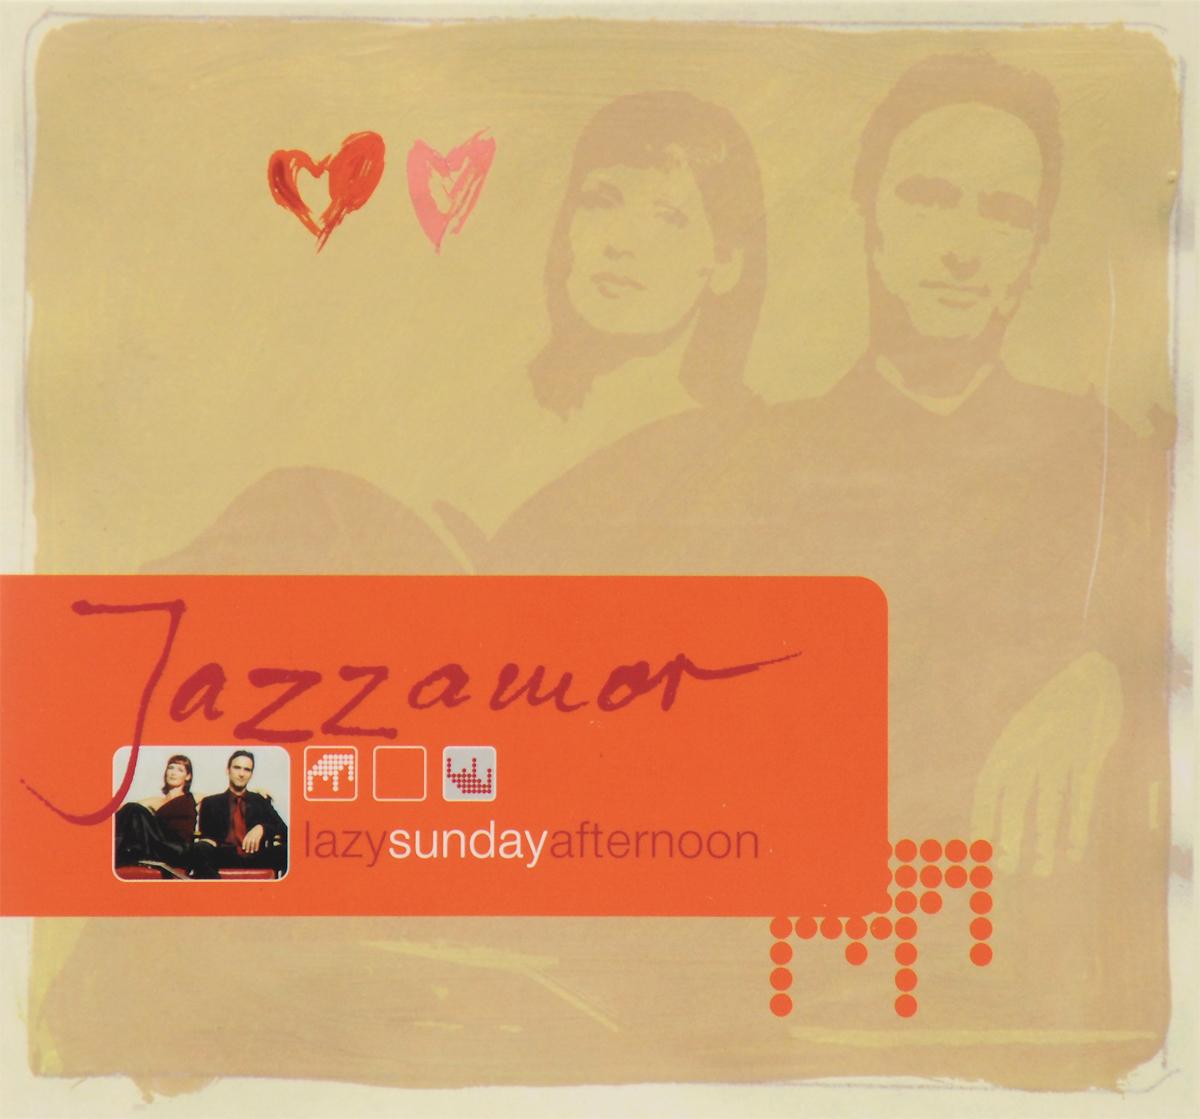 Jazzamor. Lazy Sunday Afternoon